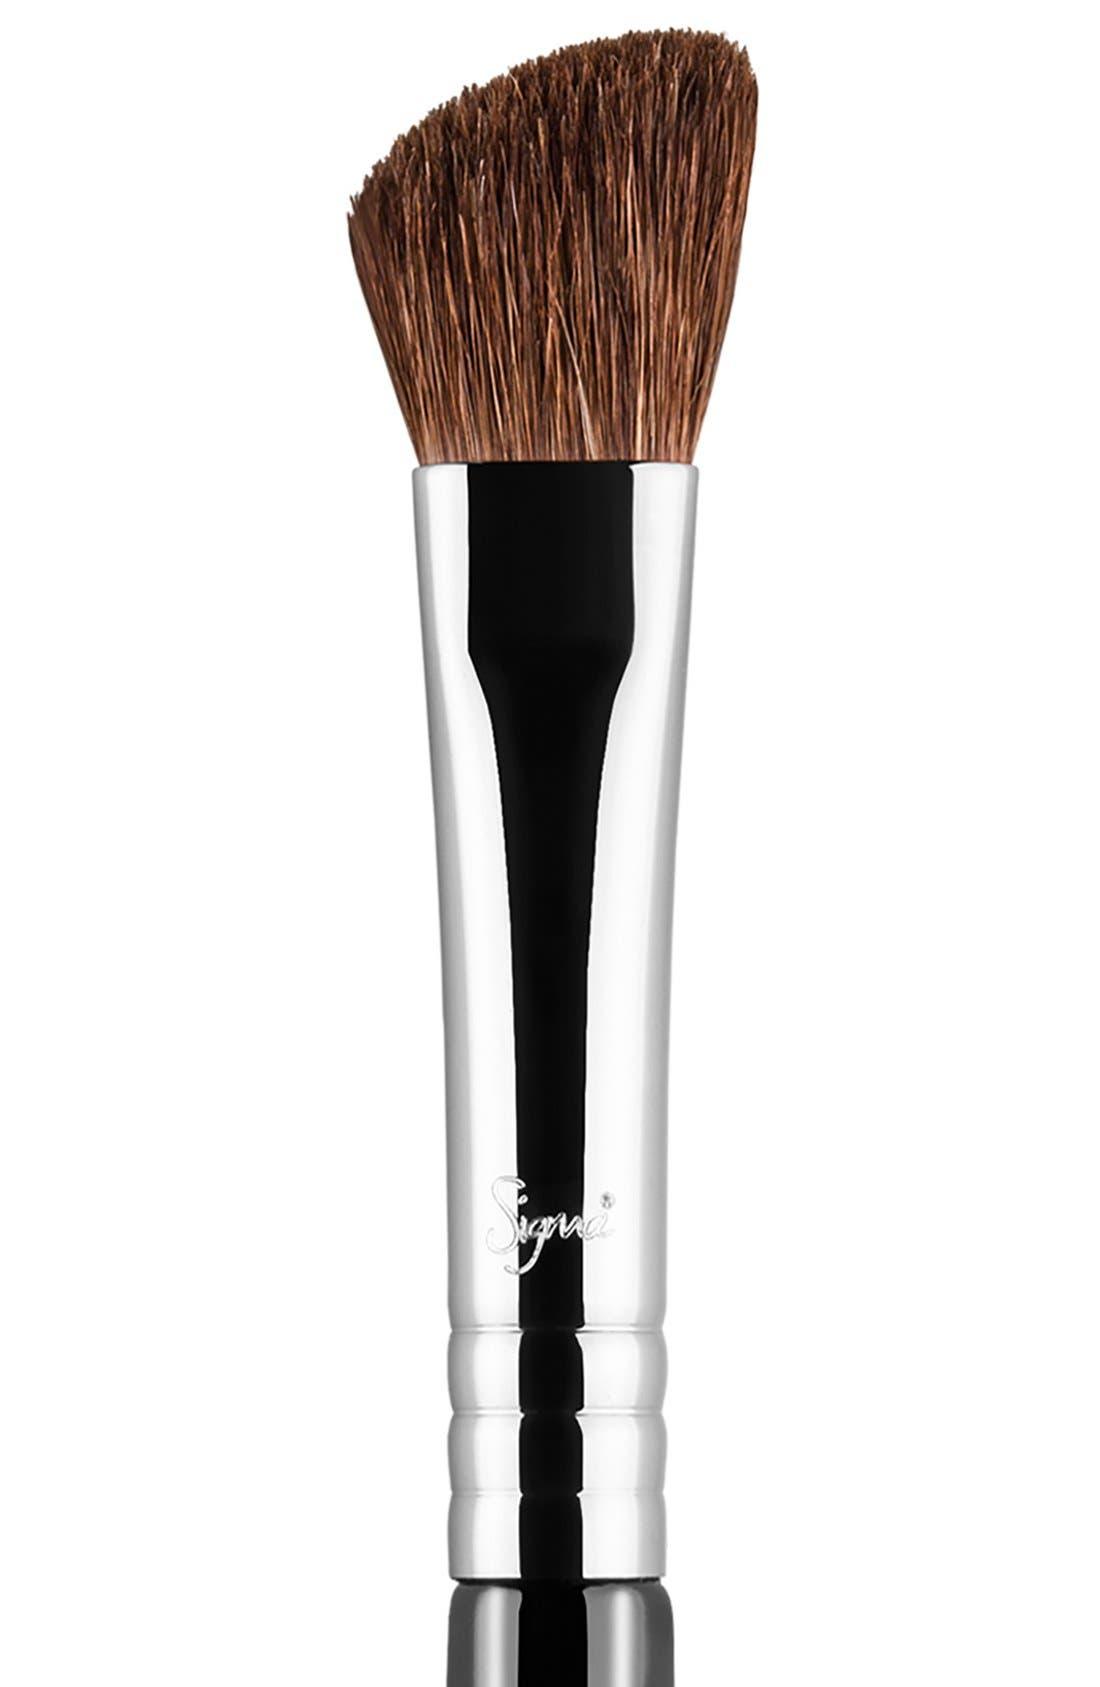 E70 Medium Angled Shading Brush,                             Alternate thumbnail 2, color,                             NO COLOR